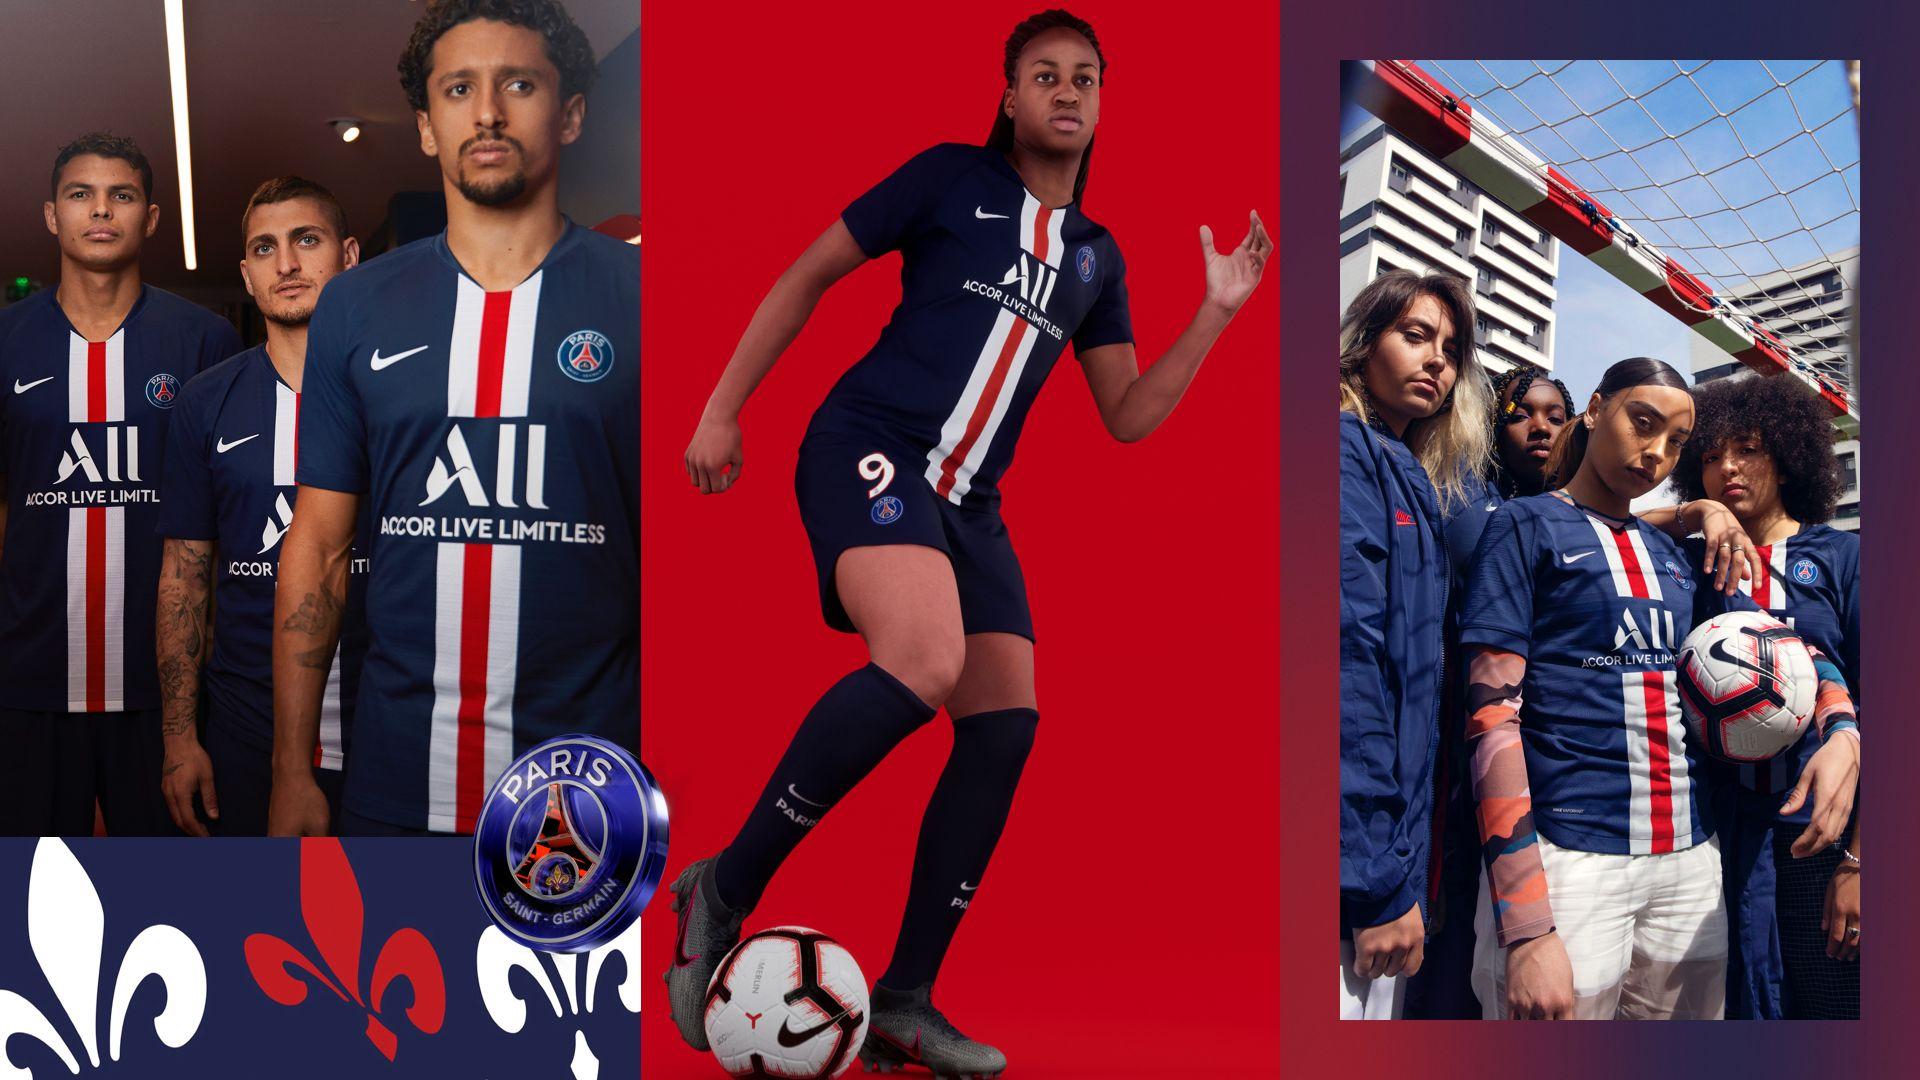 201920 Paris Saint Germain Stadium thuisjersey. NL